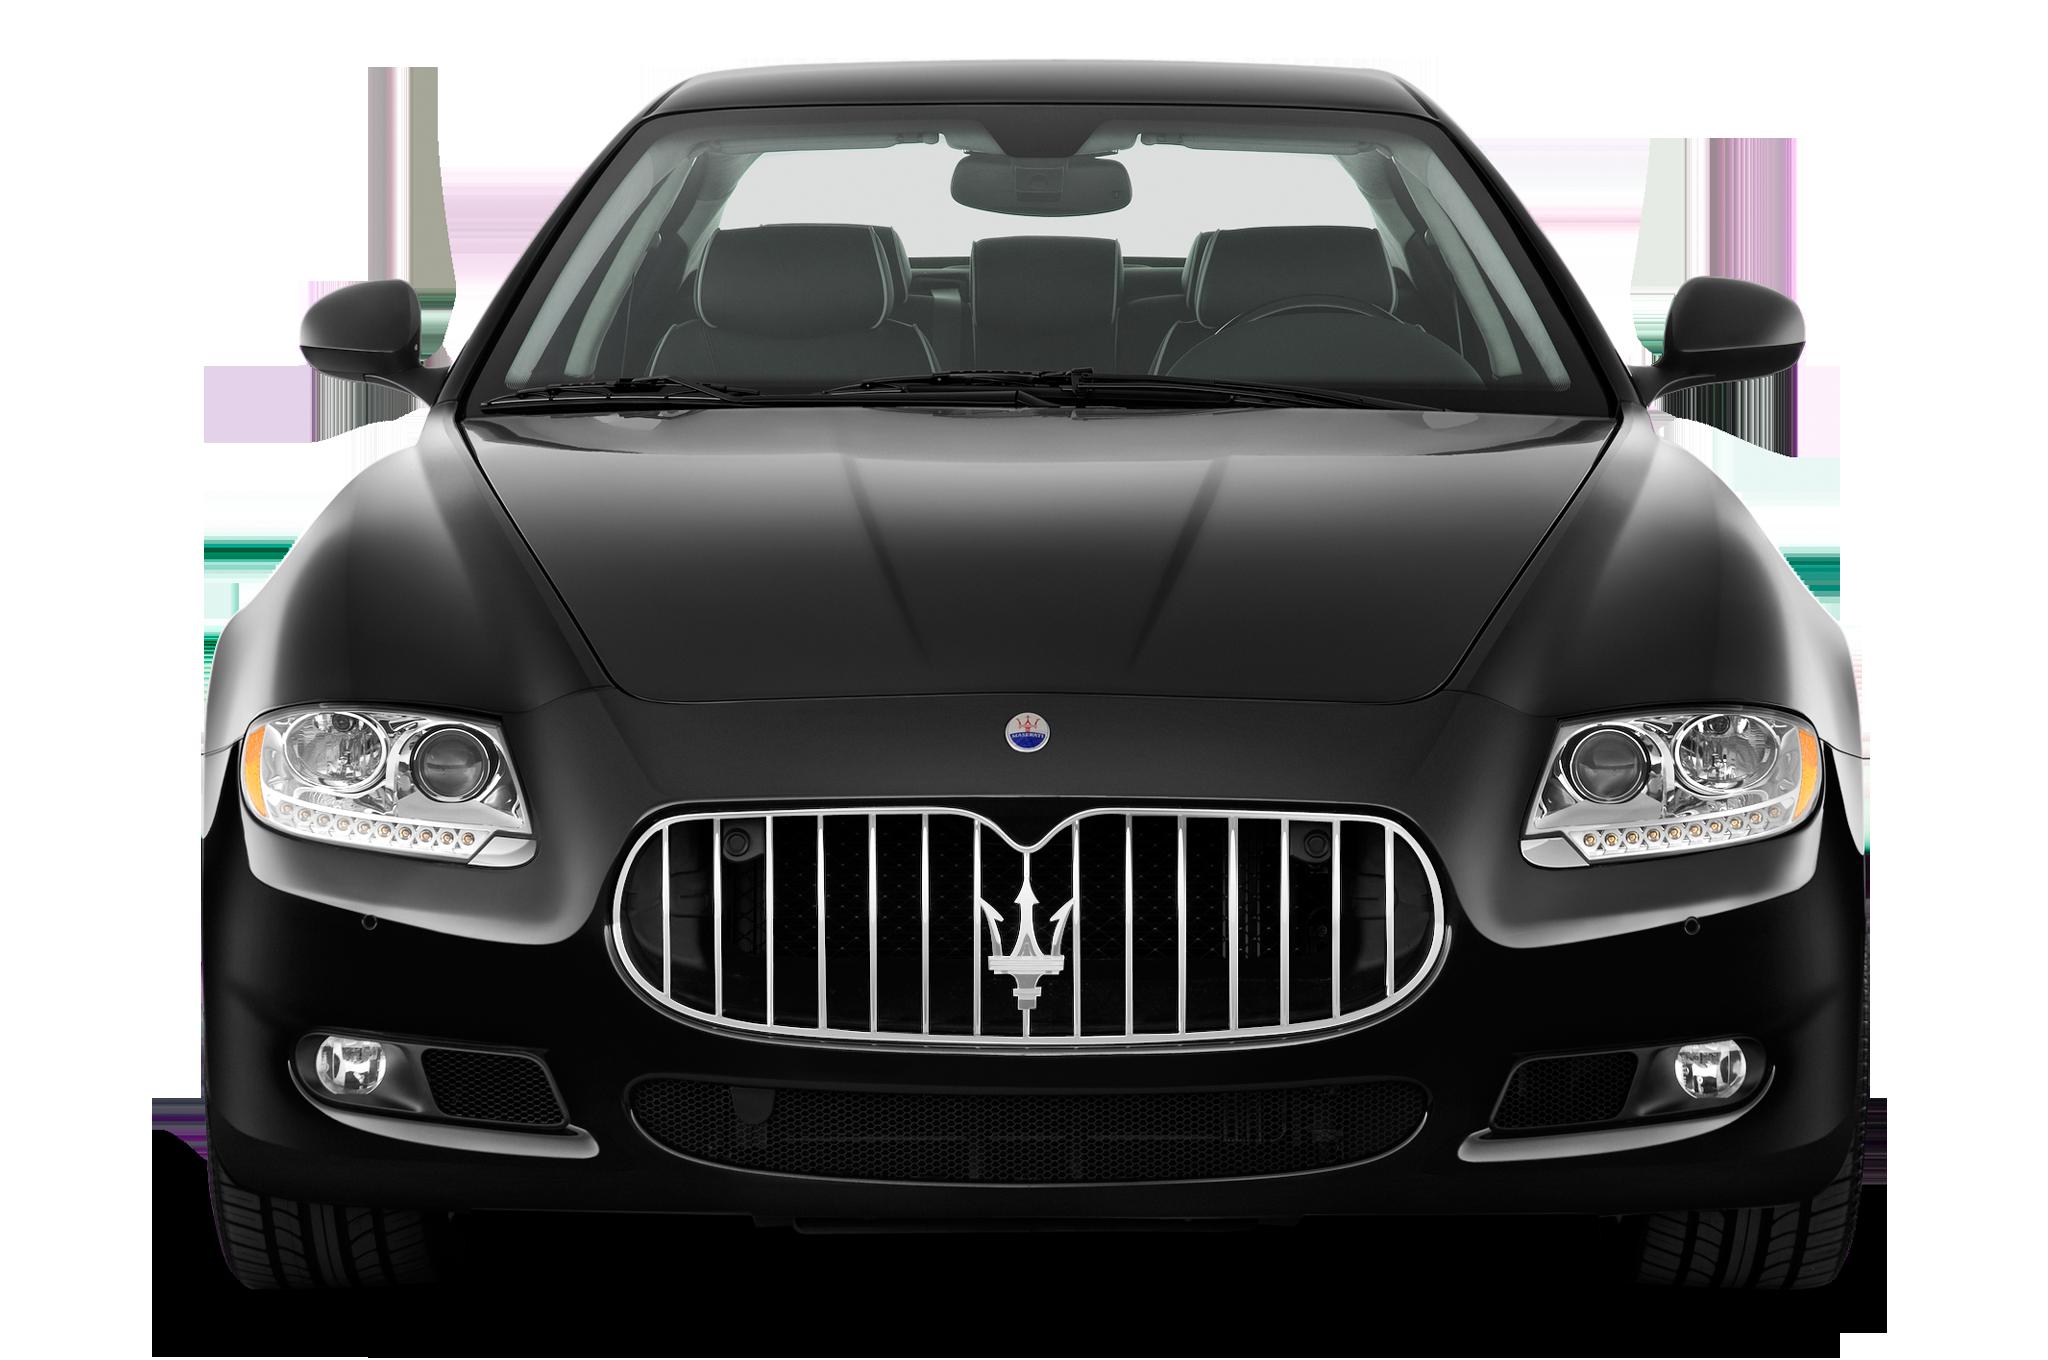 2009 Maserati Quattroporte S - Maserati Luxury Sedan ...